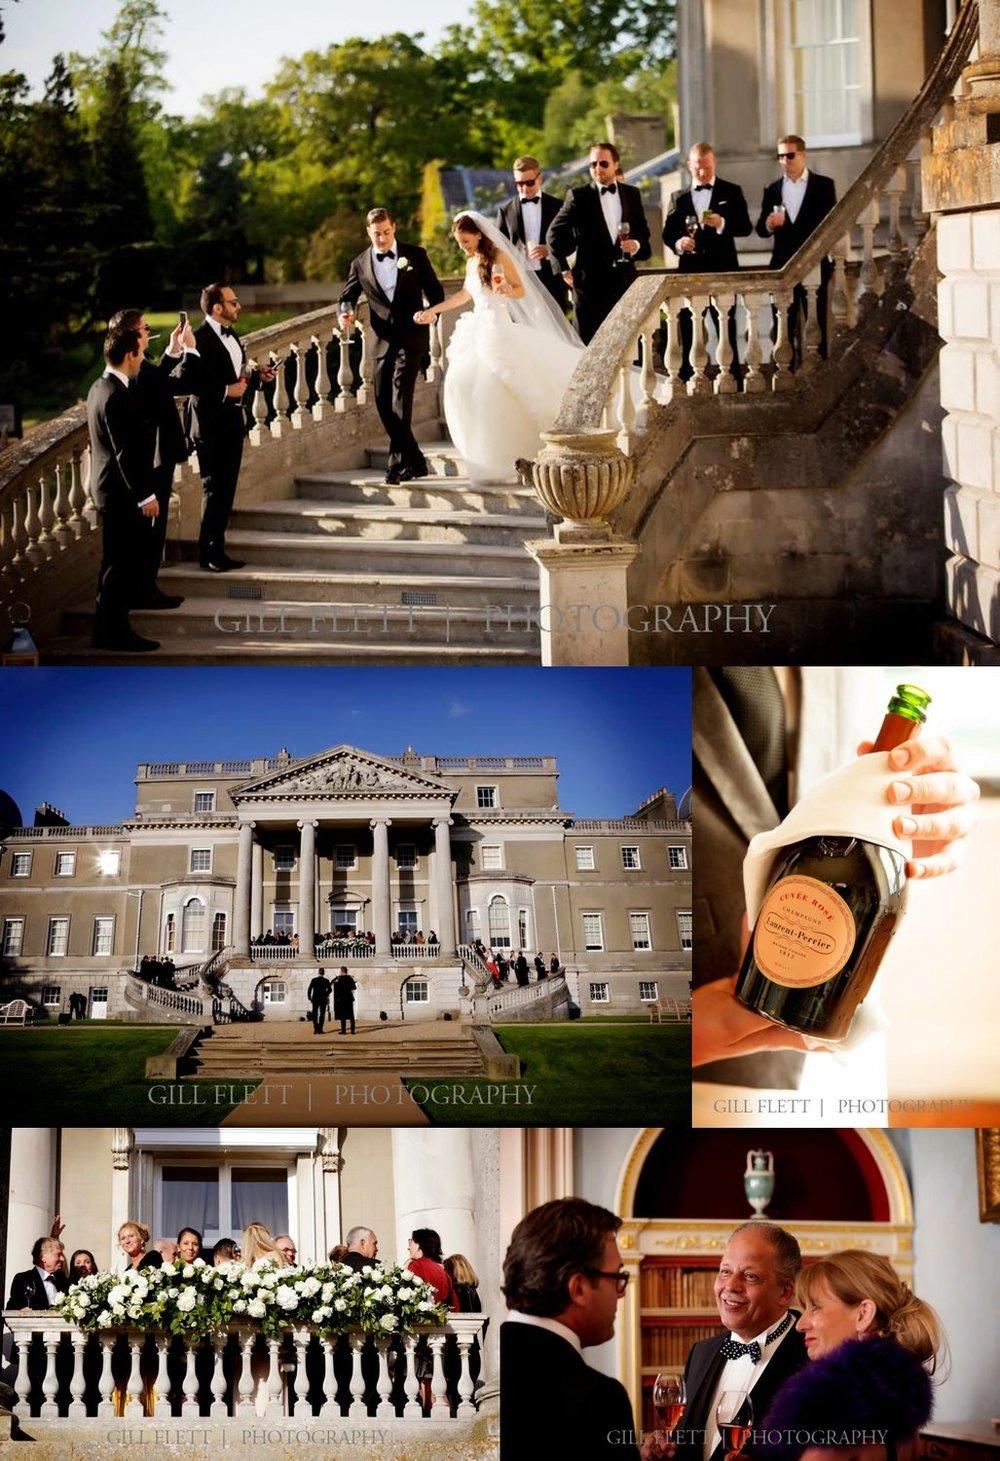 wrotham-black-tie-reception-wedding-gillflett-photo_img_0017.jpg